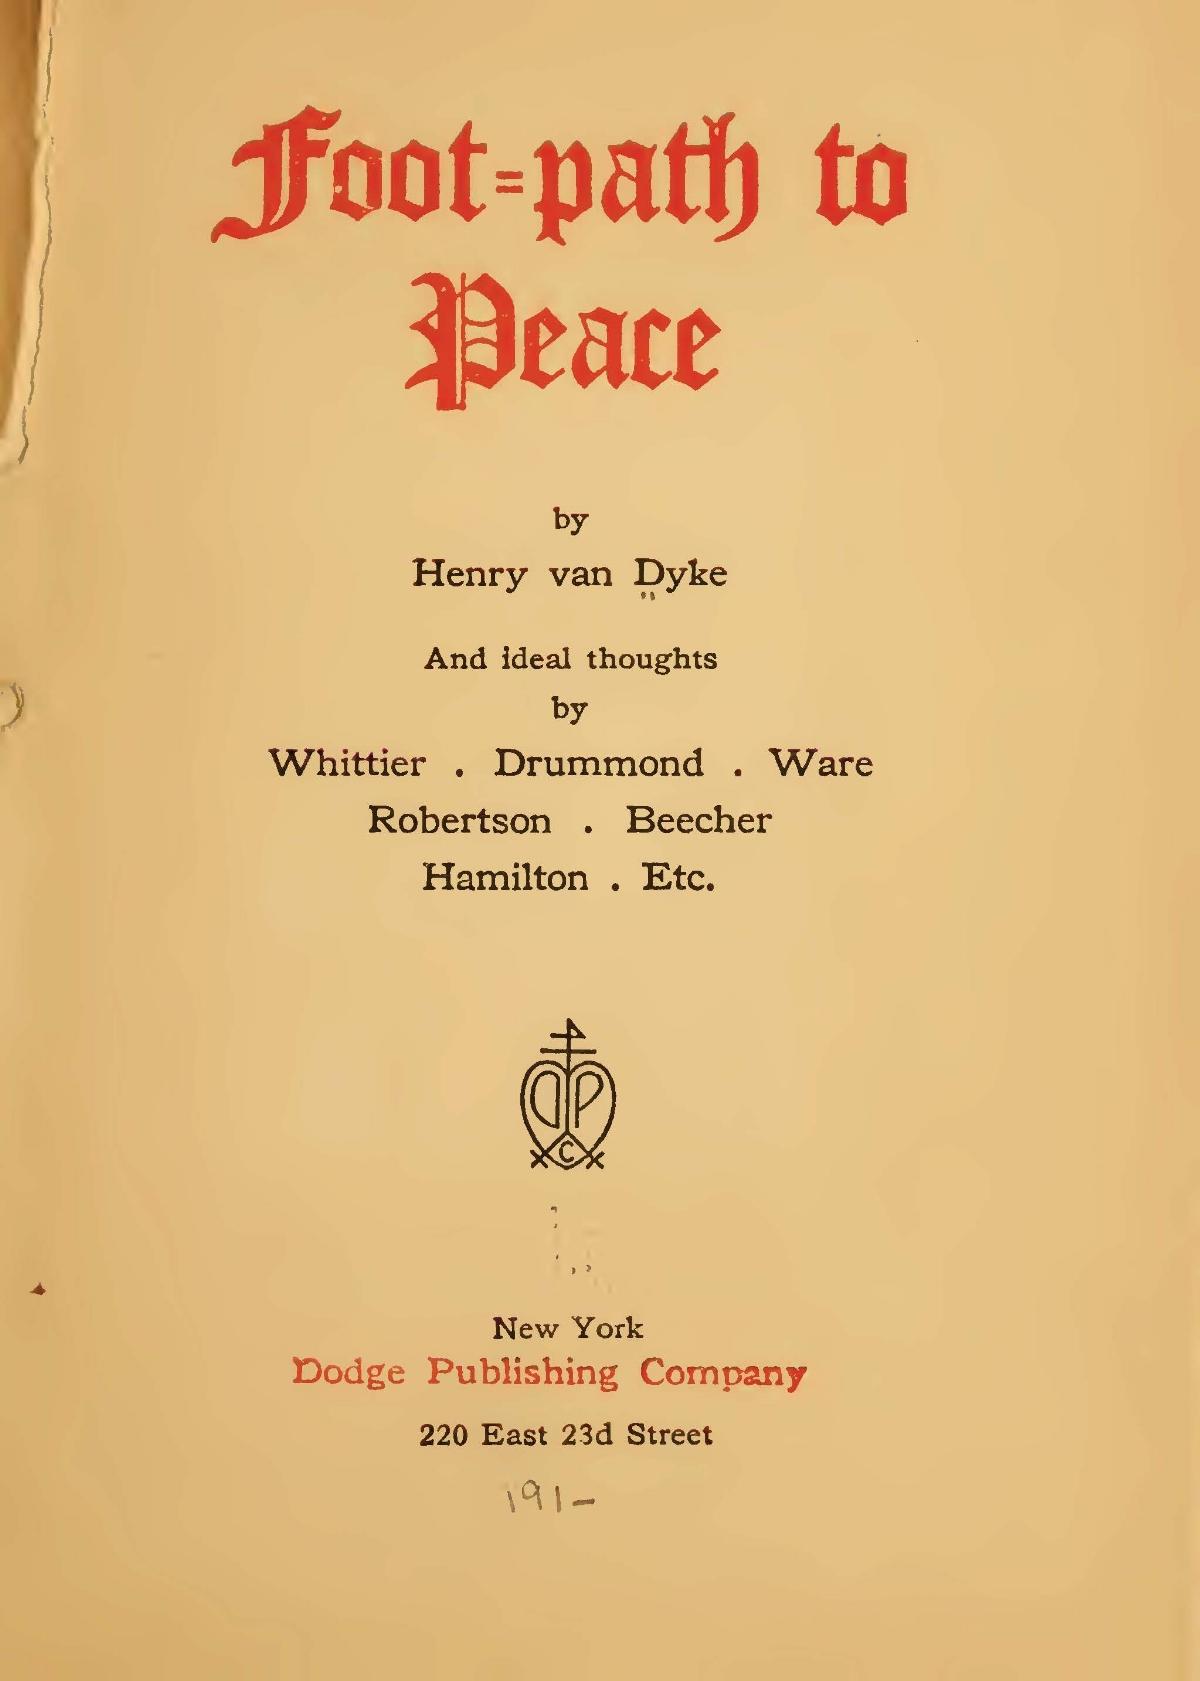 Van Dyke, Jr., Henry Jackson, Foot-Path to Peace Title Page.jpg